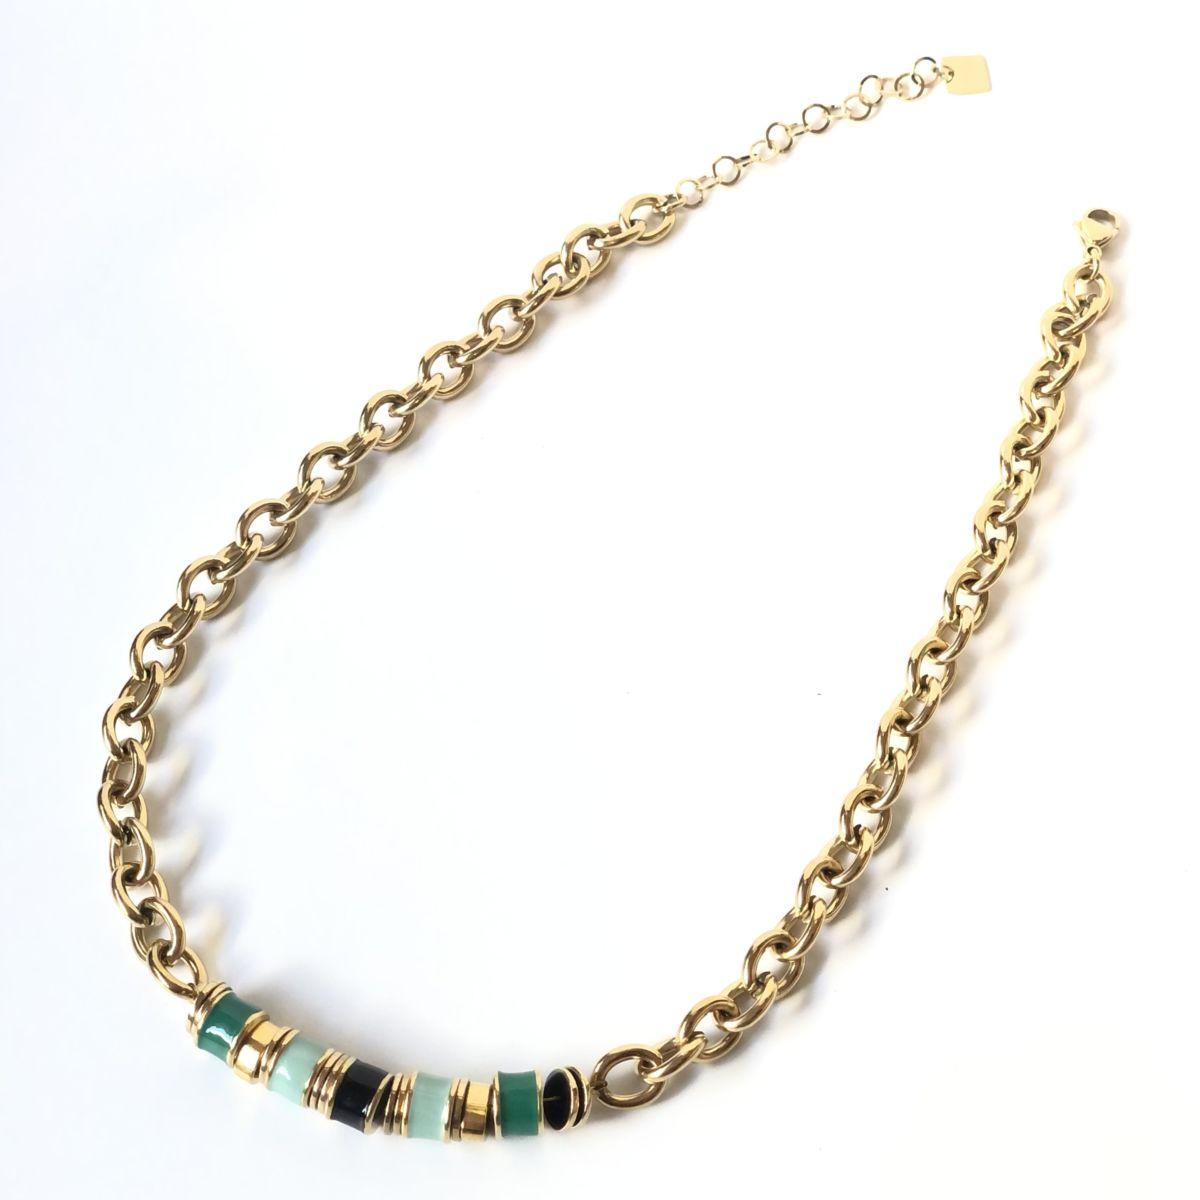 By Destele collier grosse maille et perles vertes